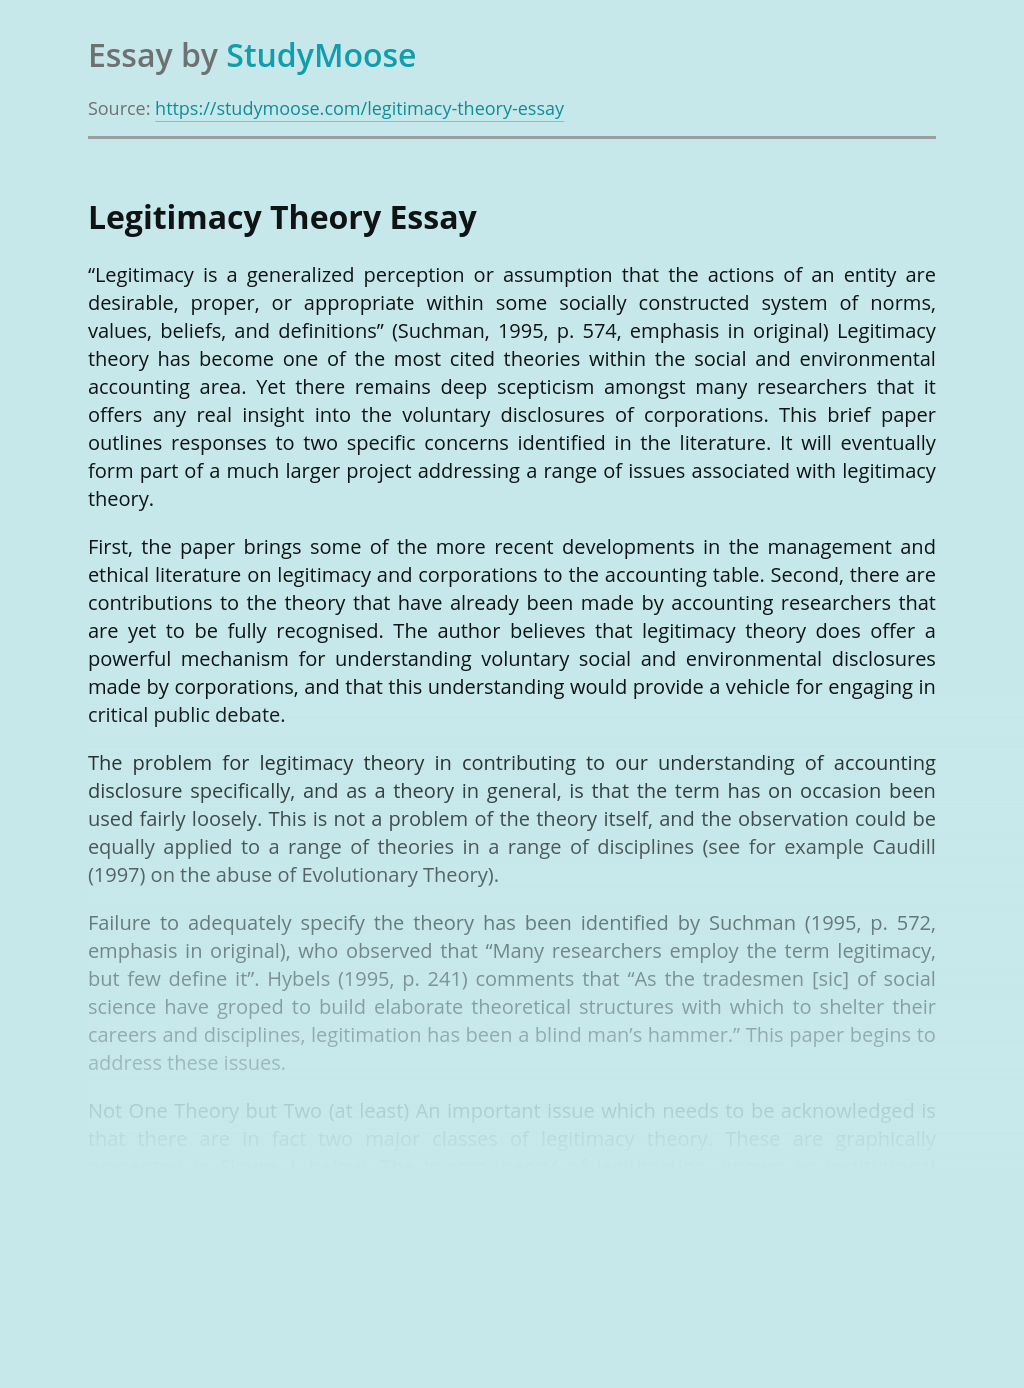 Power of Legitimacy Theory